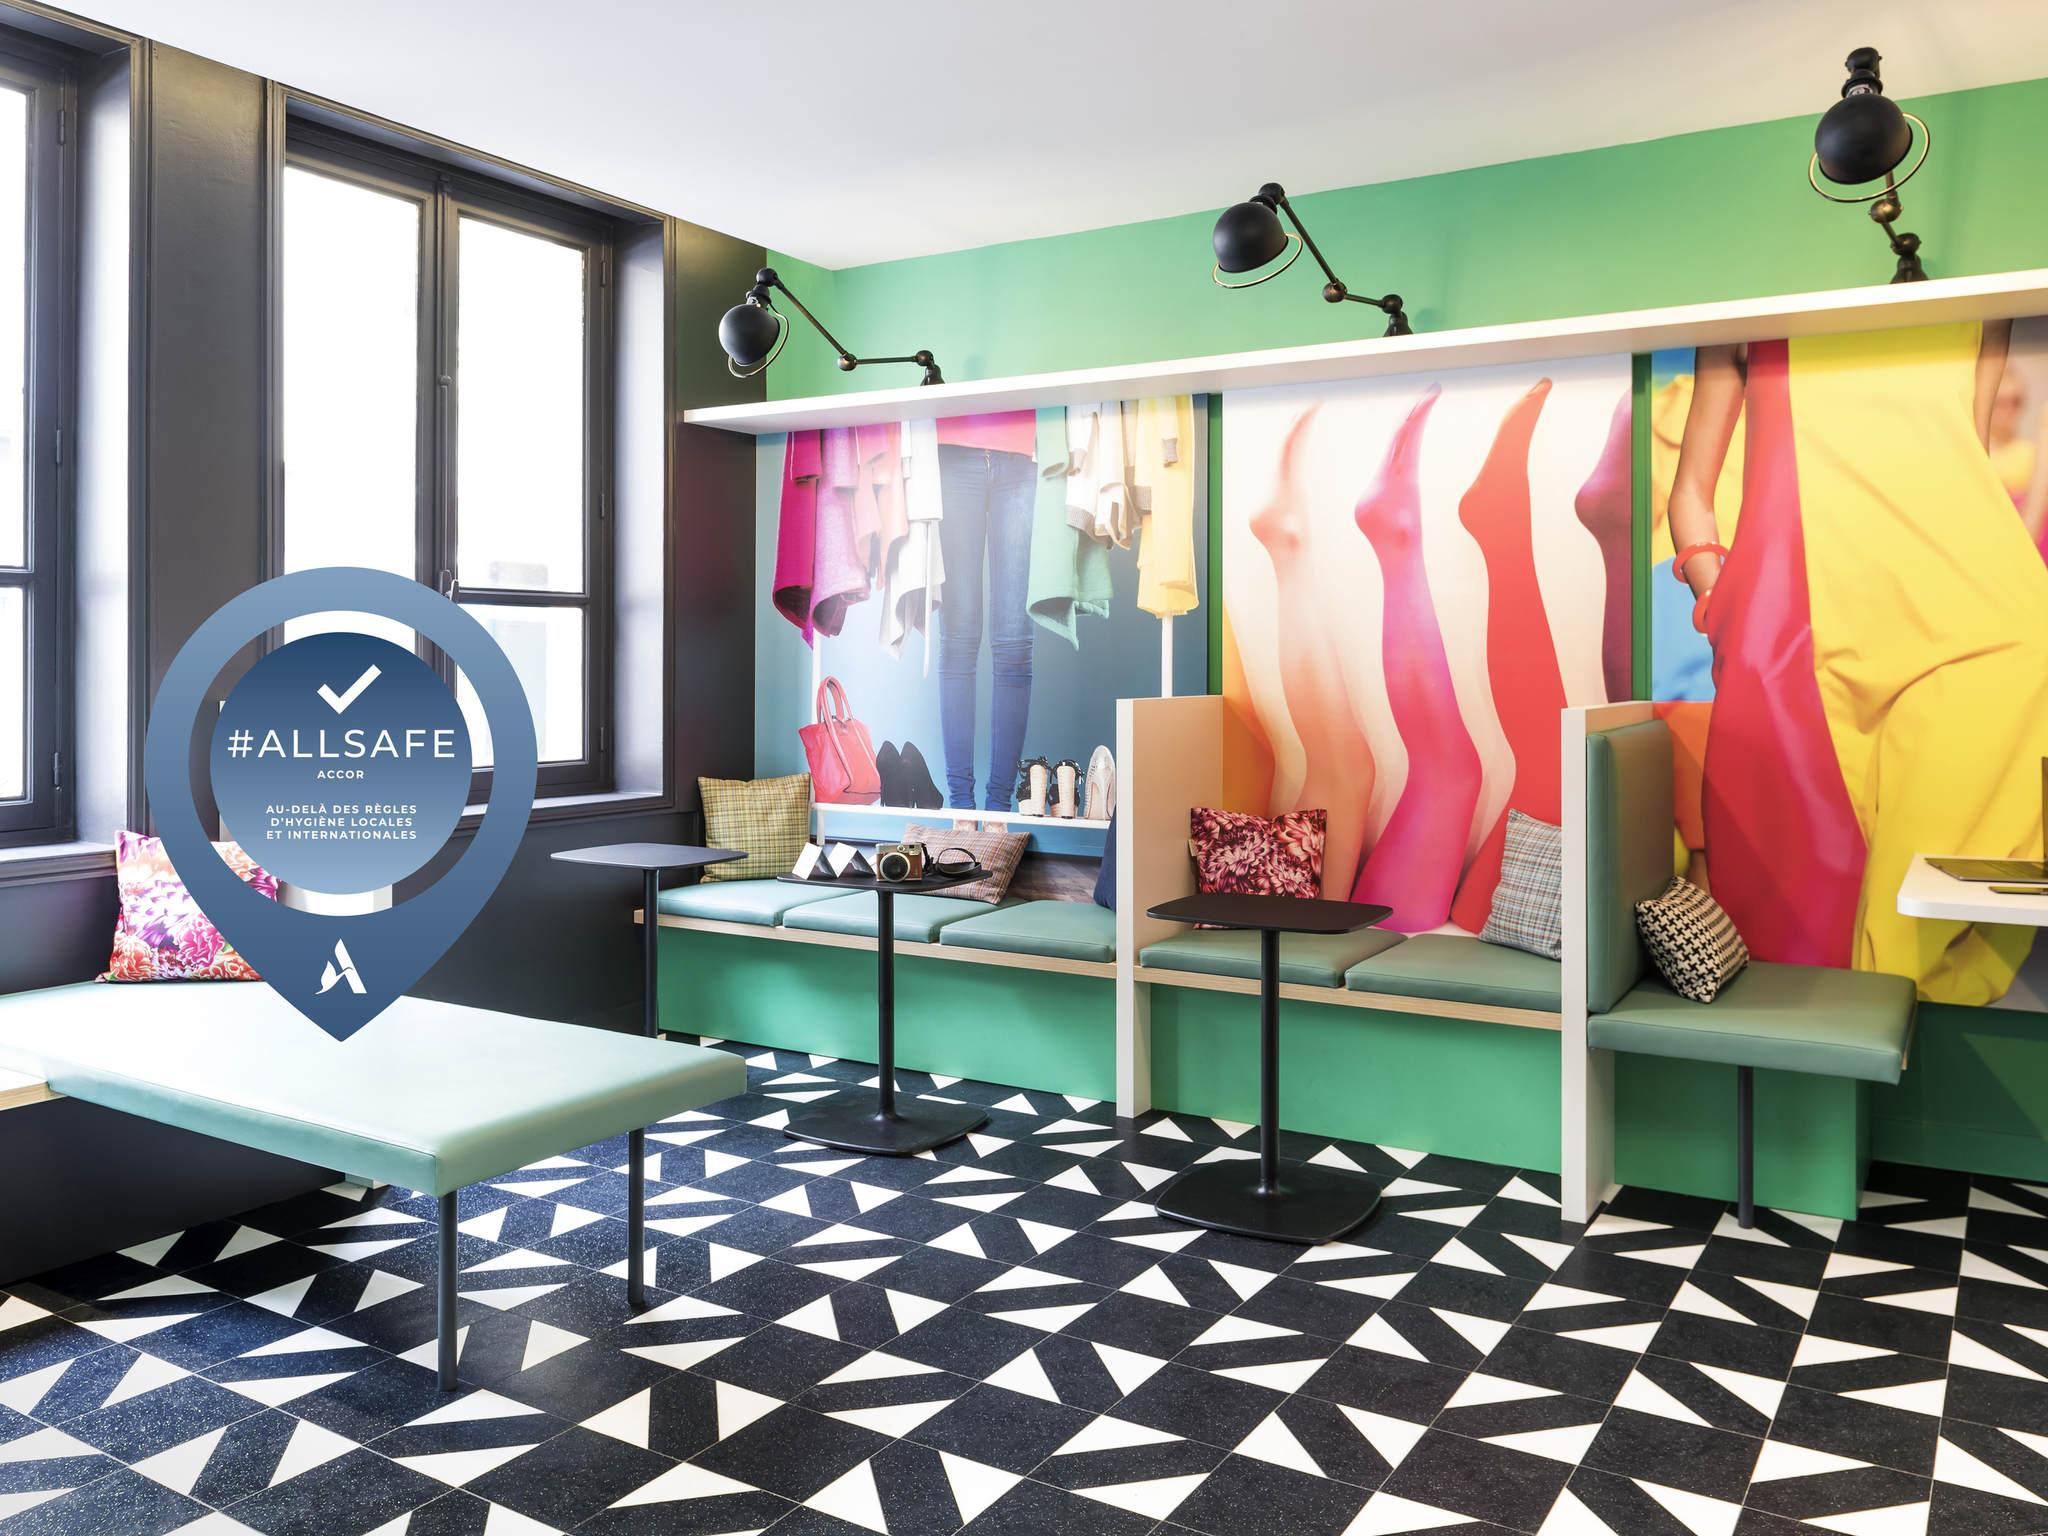 Hotel – Ibis Styles Paris Gare Saint Lazare